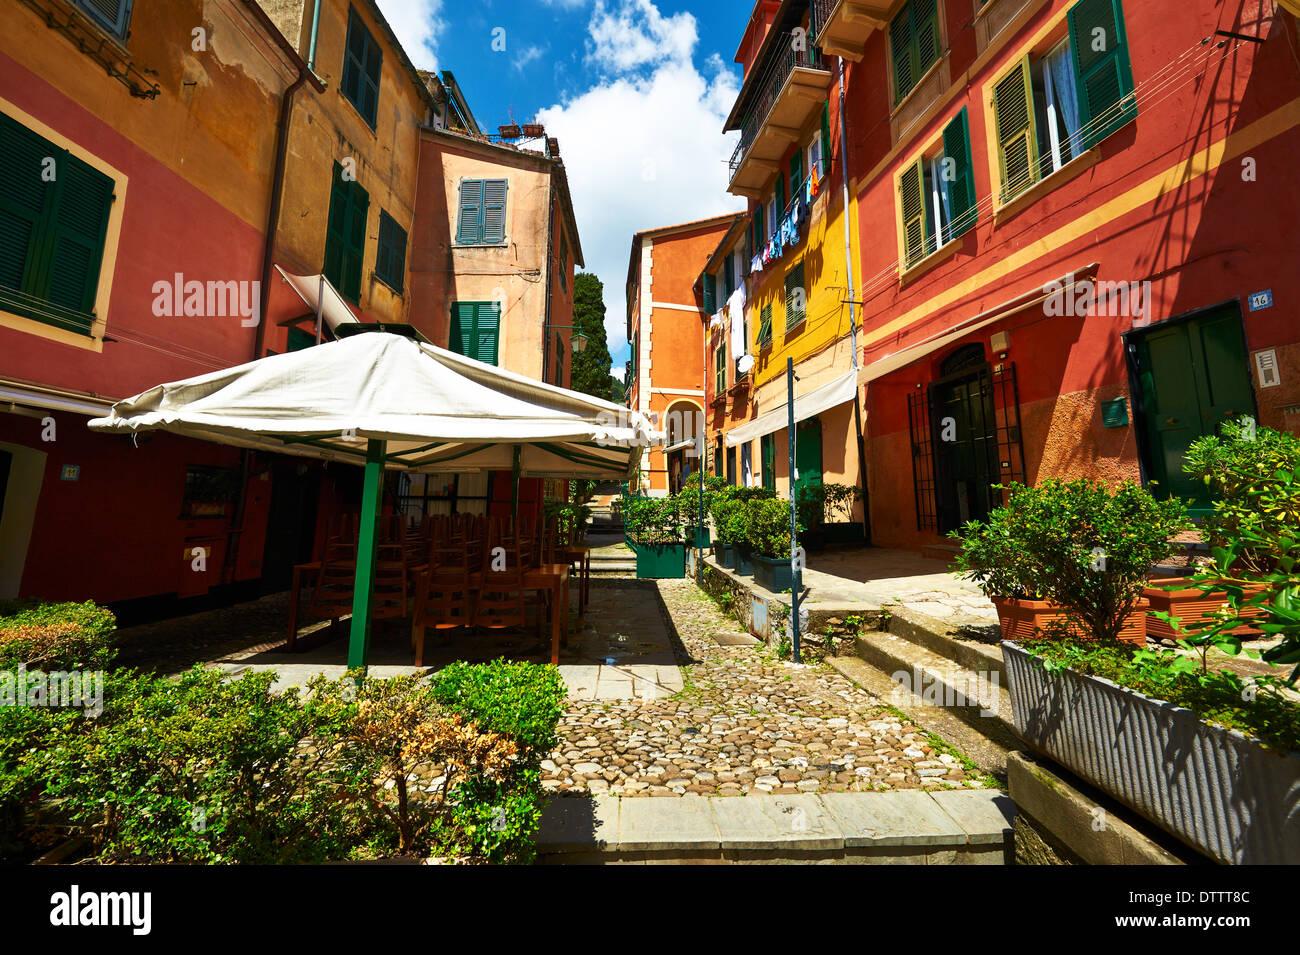 Portofino village on Ligurian coast, Italy Stock Photo